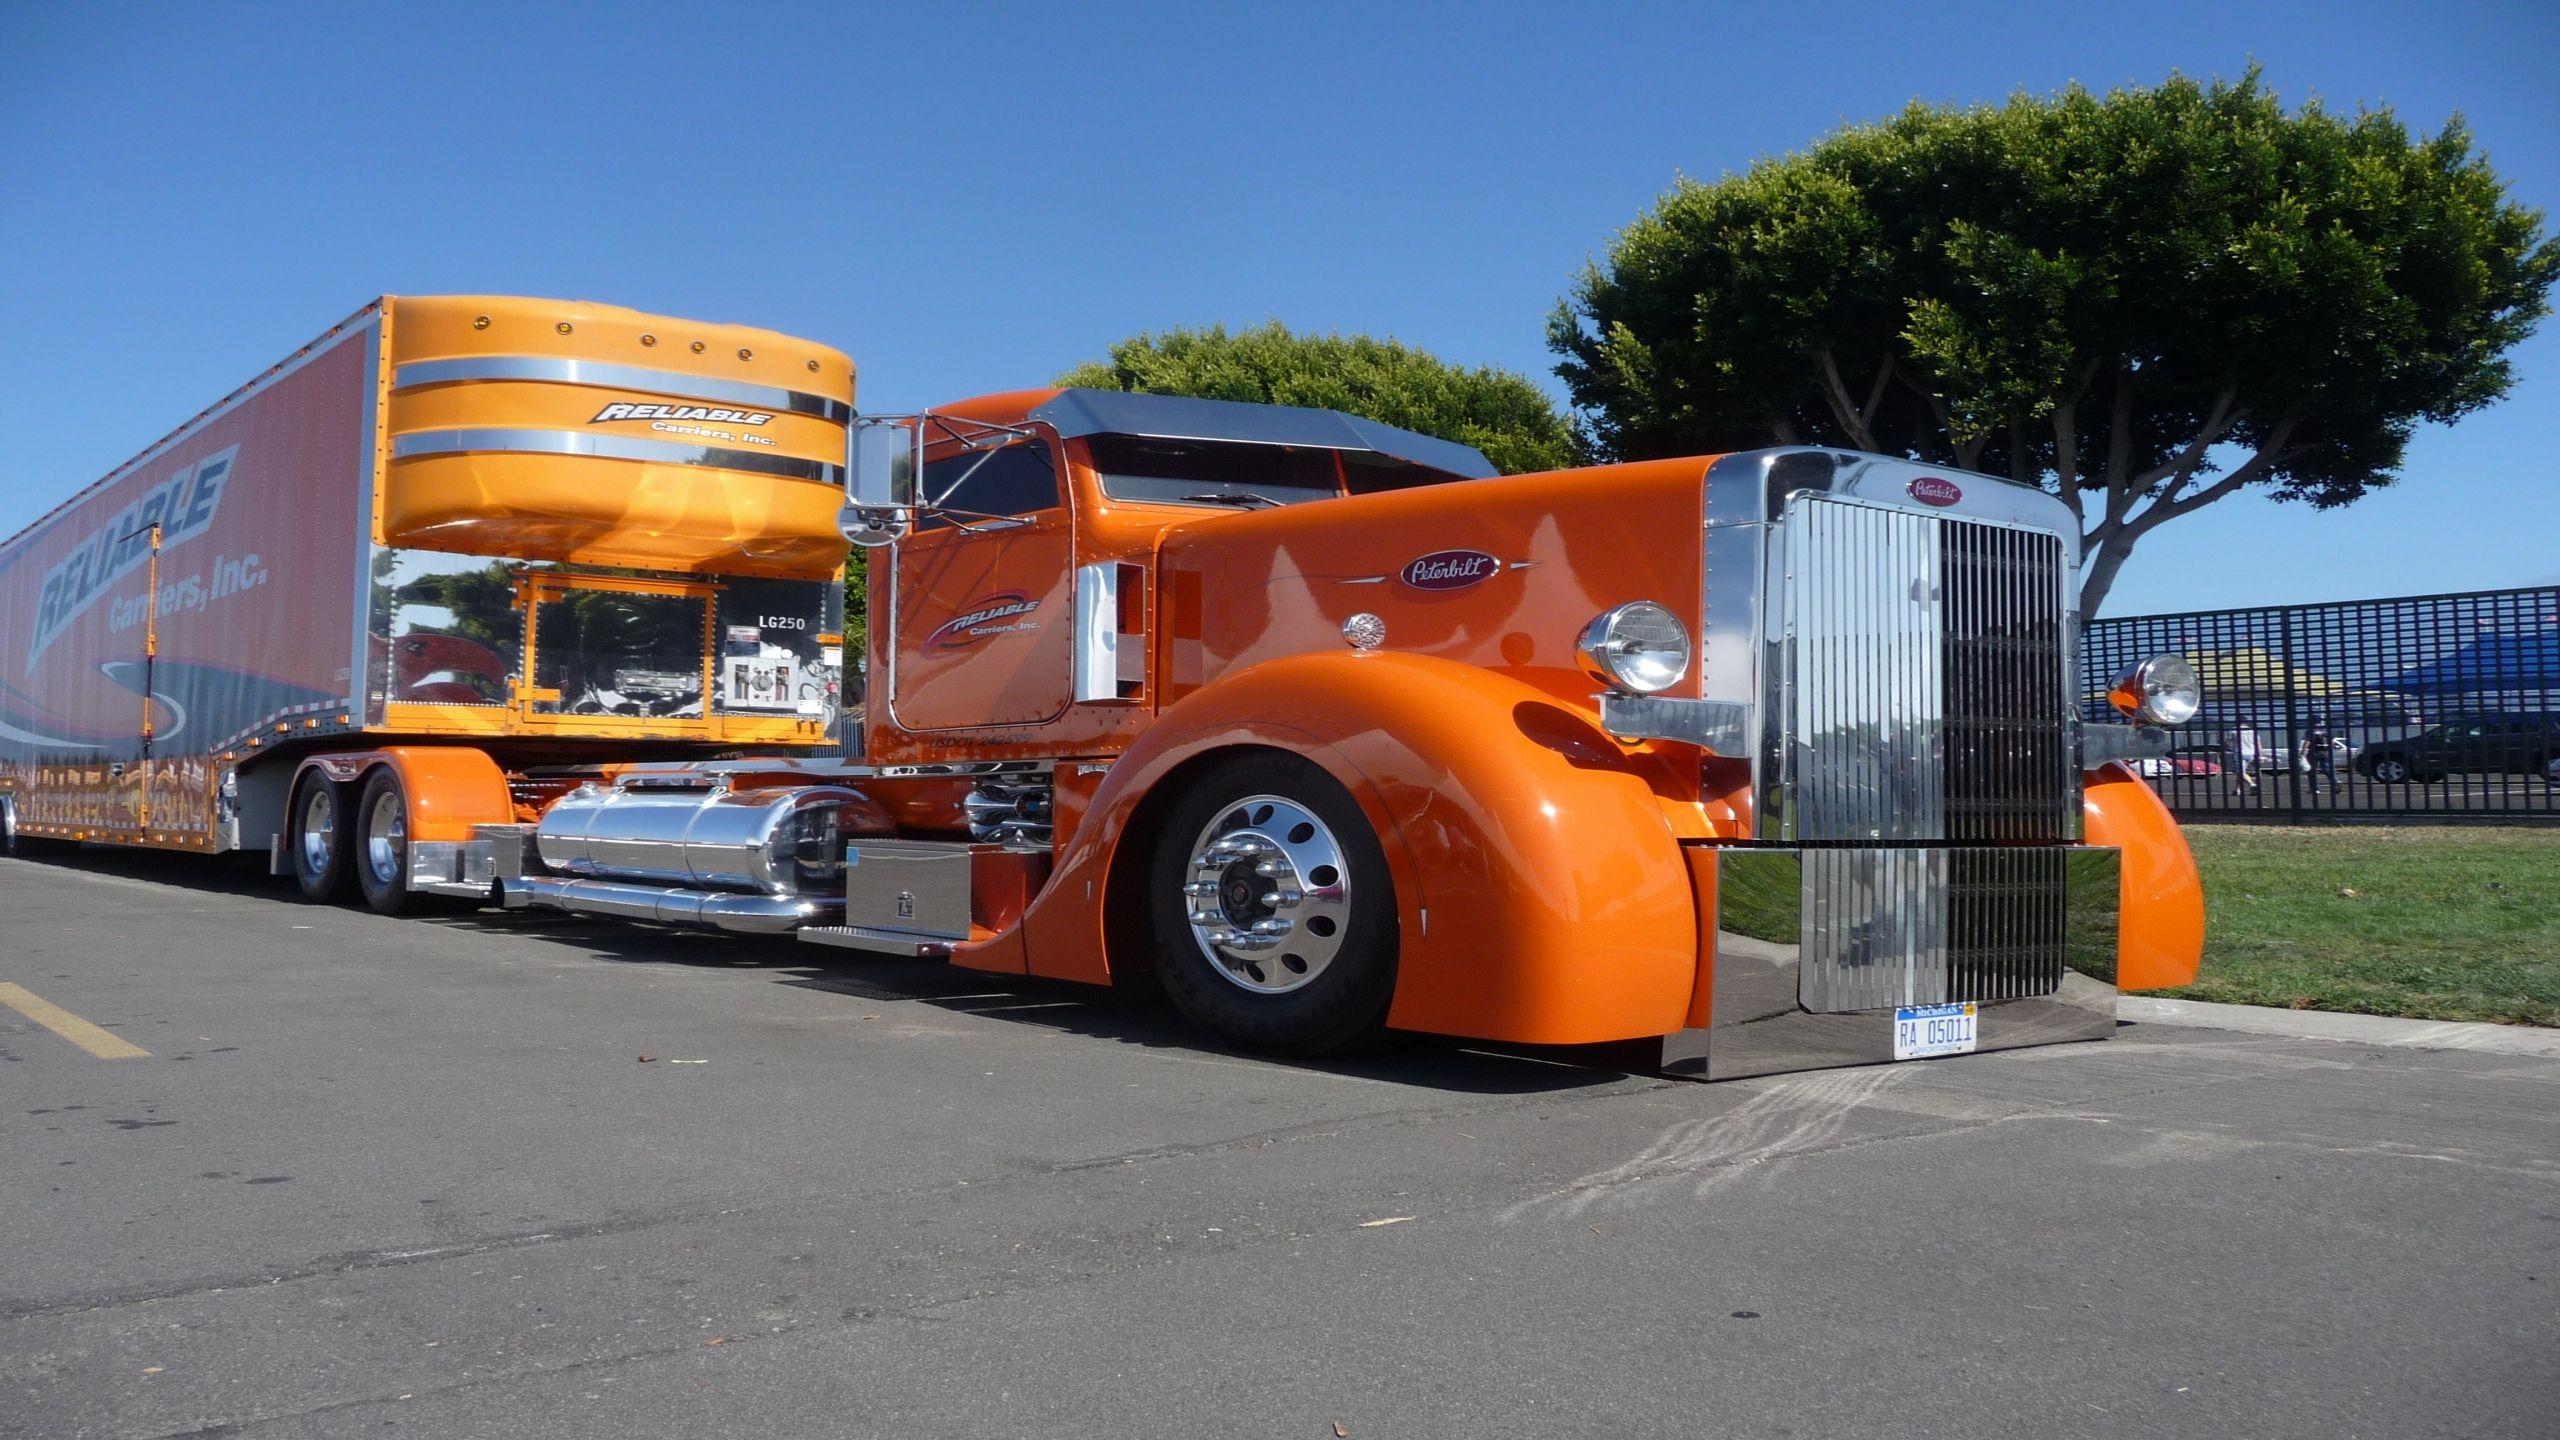 Custom Rigs Wallpapers Peterbilt Truck Reliable Rig Orange Cab Pictures